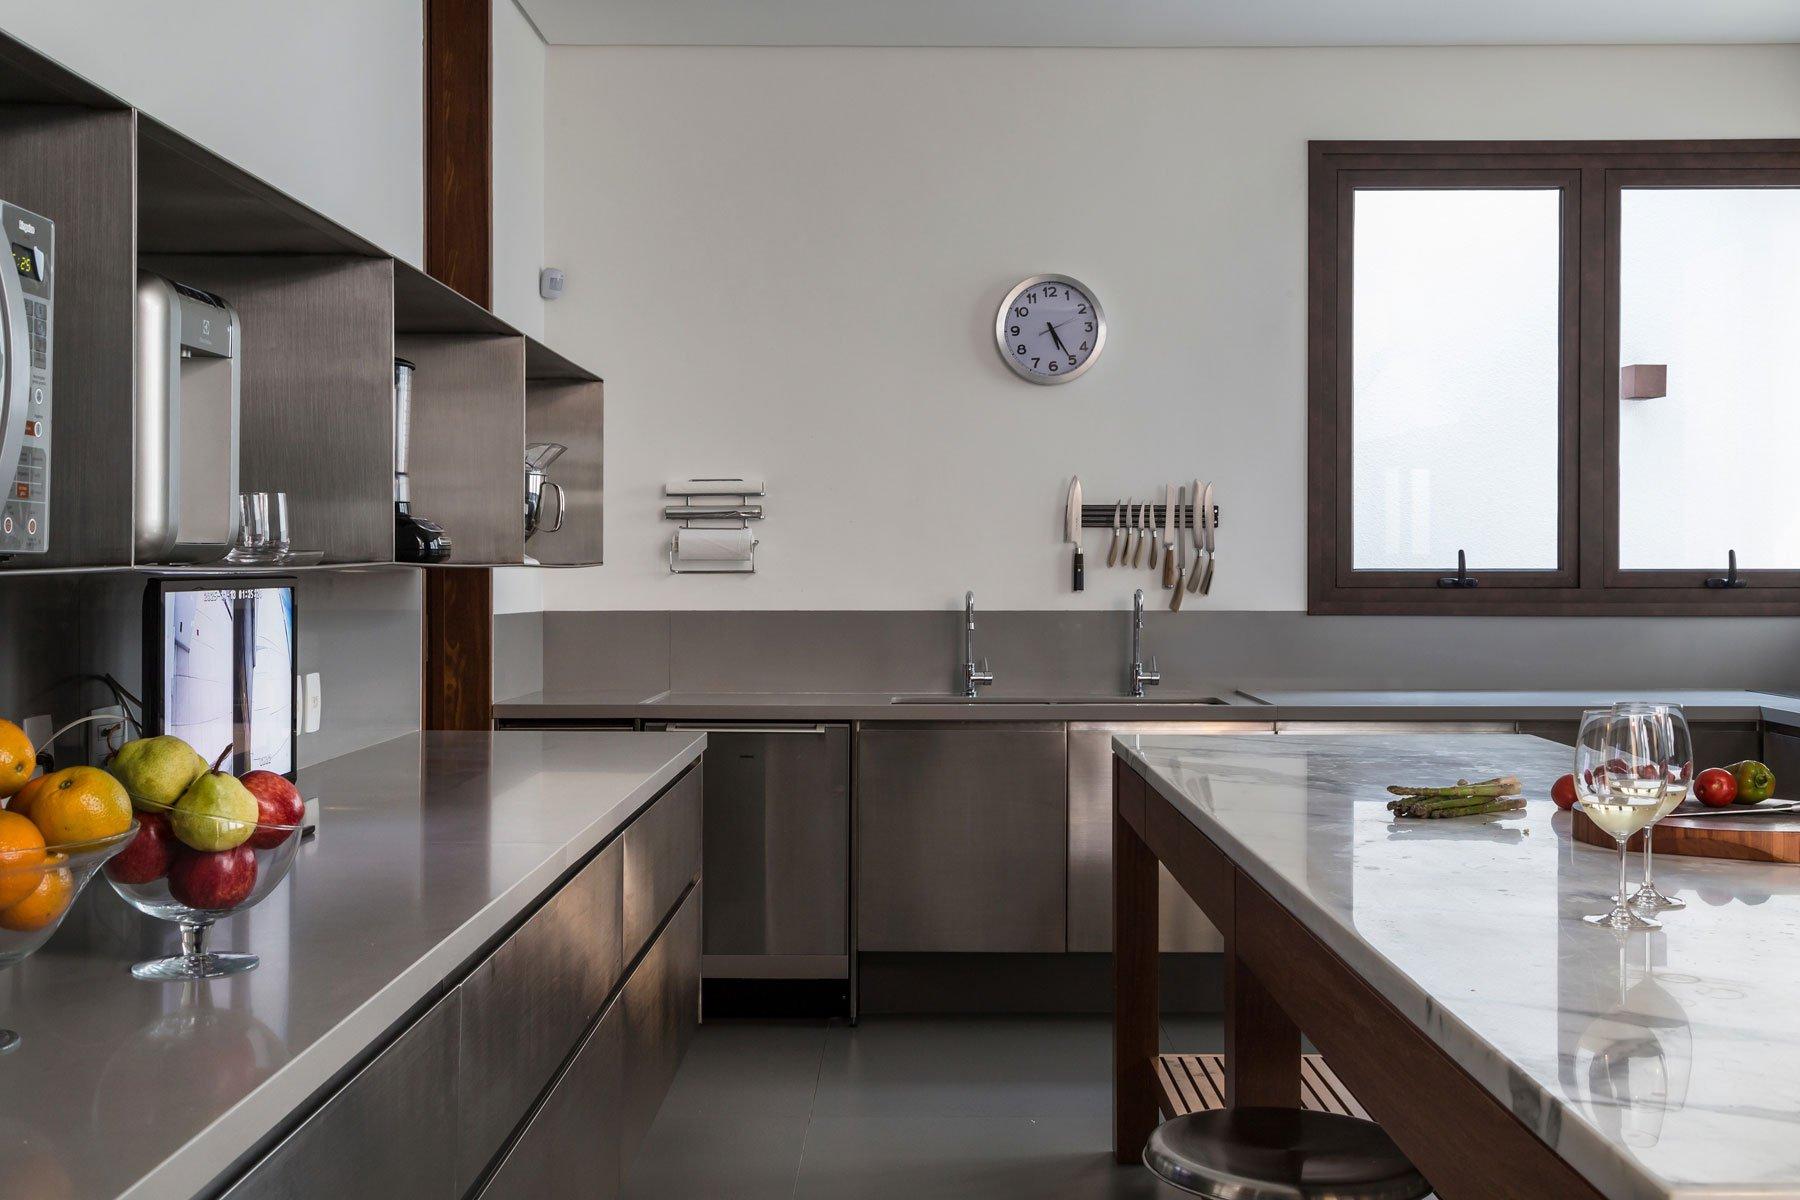 Residencia-MO-11